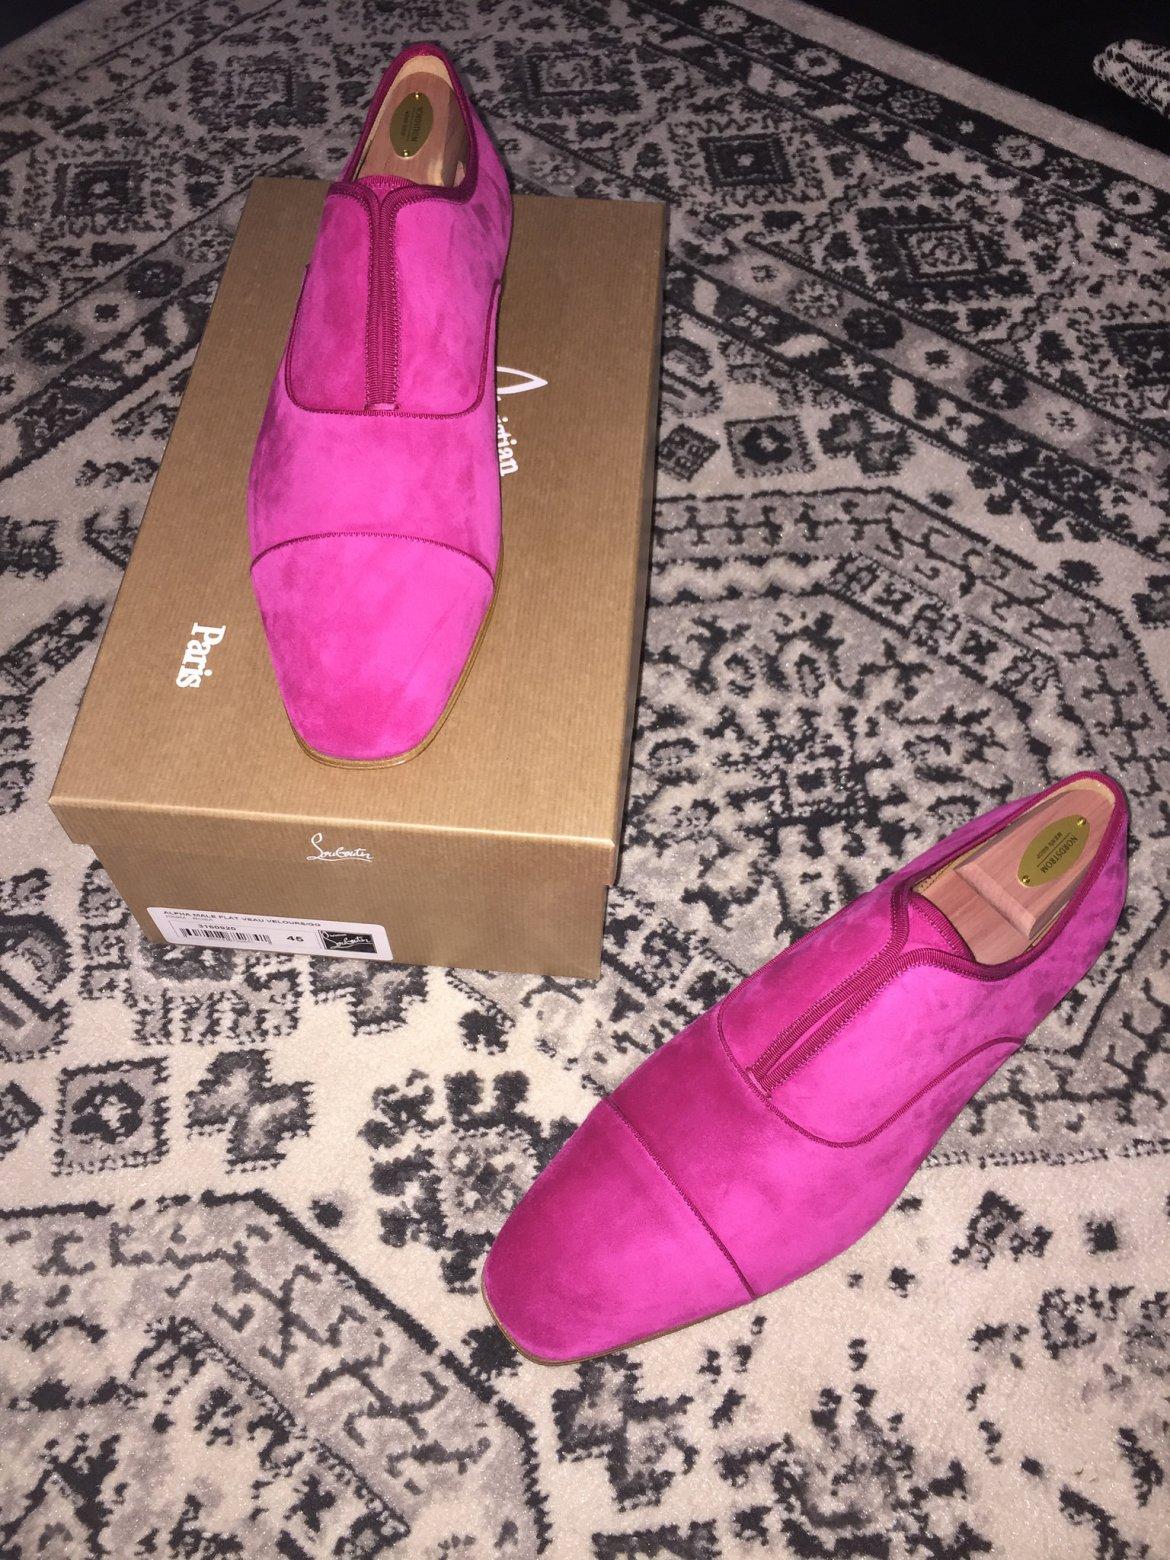 Shocking pink suede Christian Louboutin cap-toe flats for men!